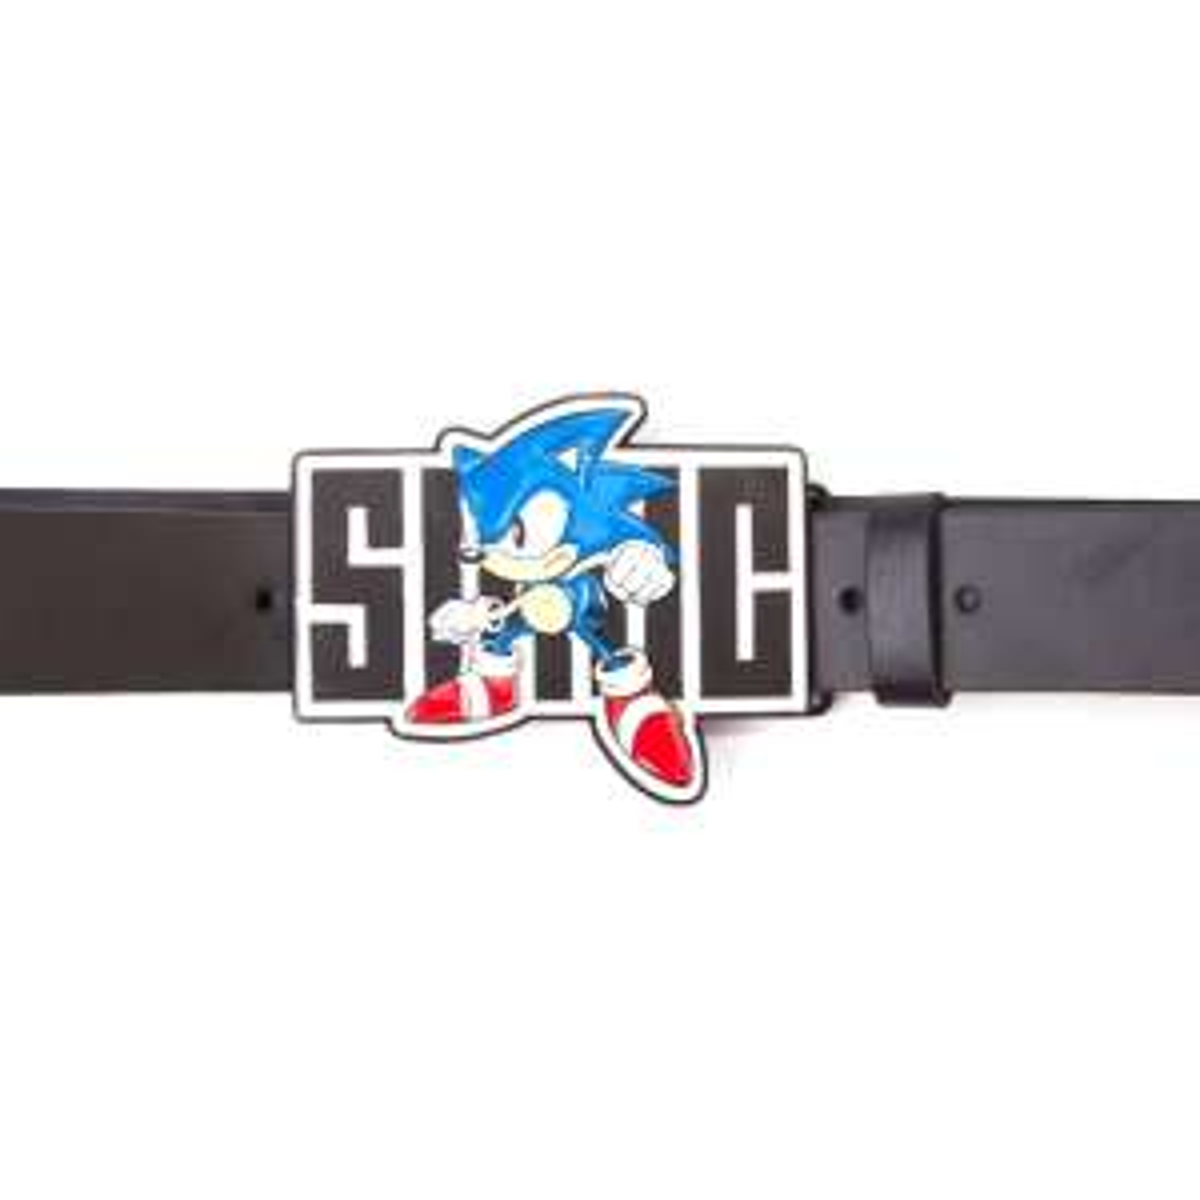 Sonic The Hedgehog Belt £12 Down To £2.50 at Sega Shop (+£2 Delivery)